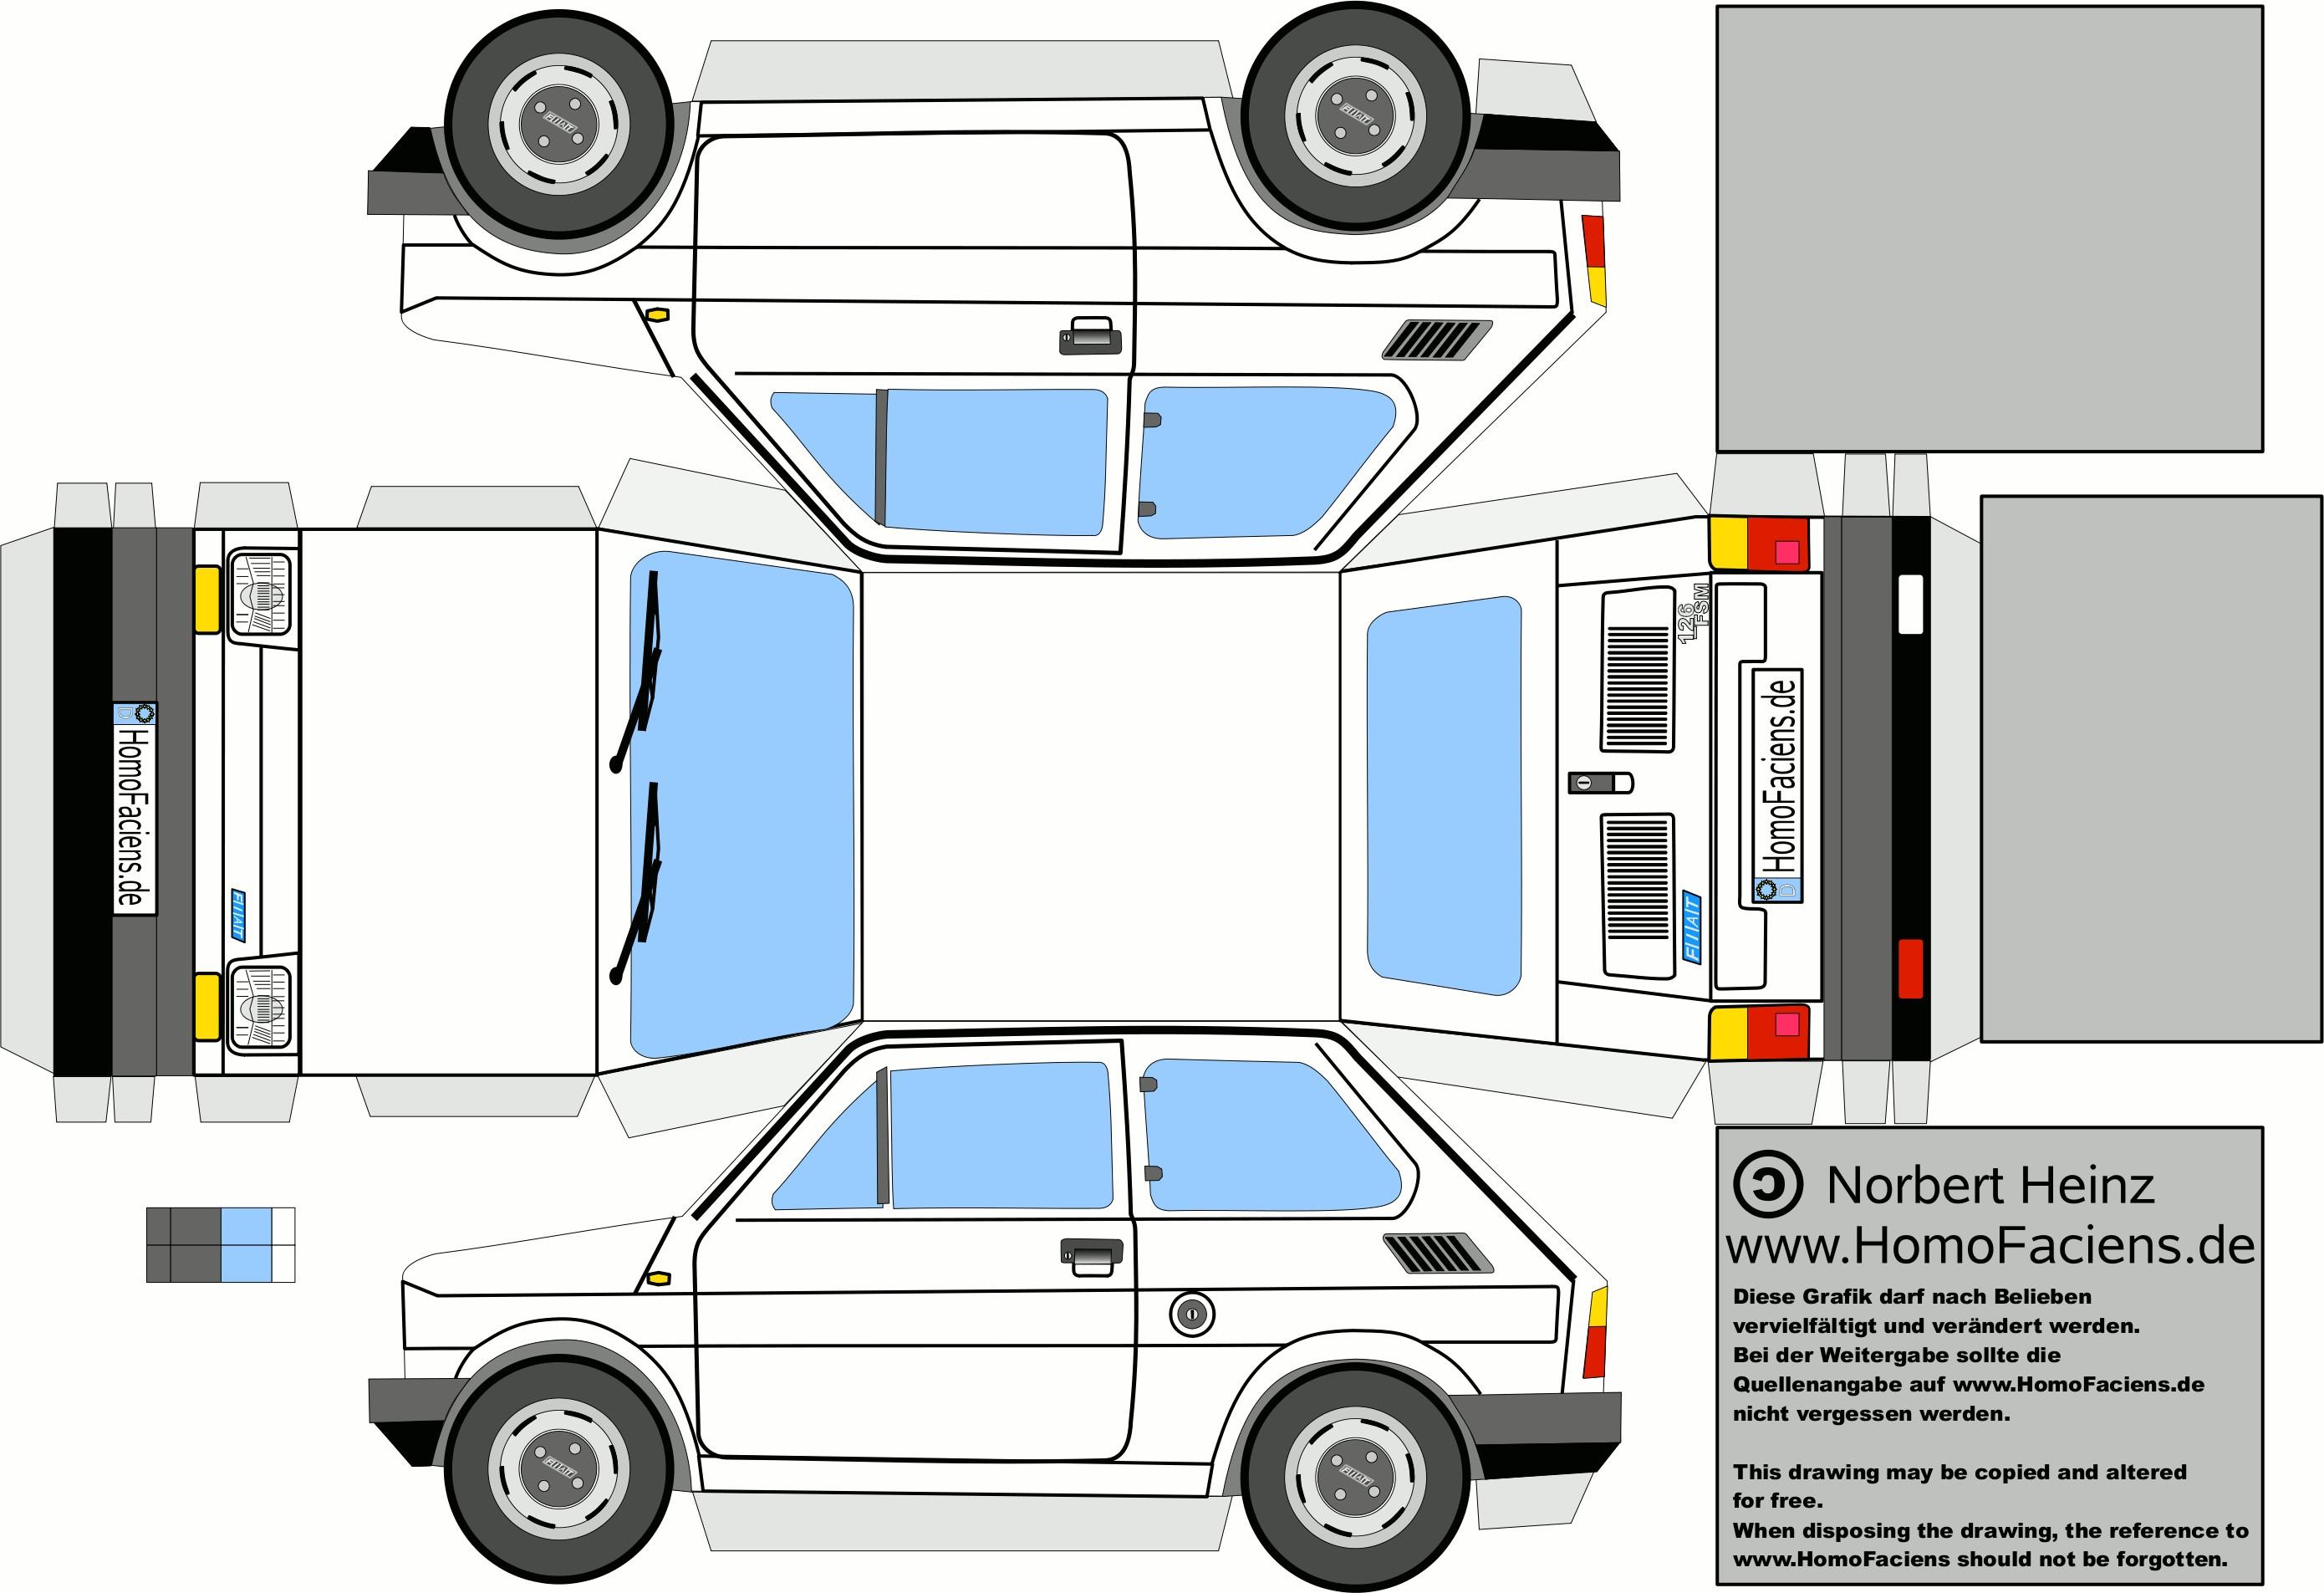 Honda Papercraft Fiat 126 Papercraft Homofaciens Downloads